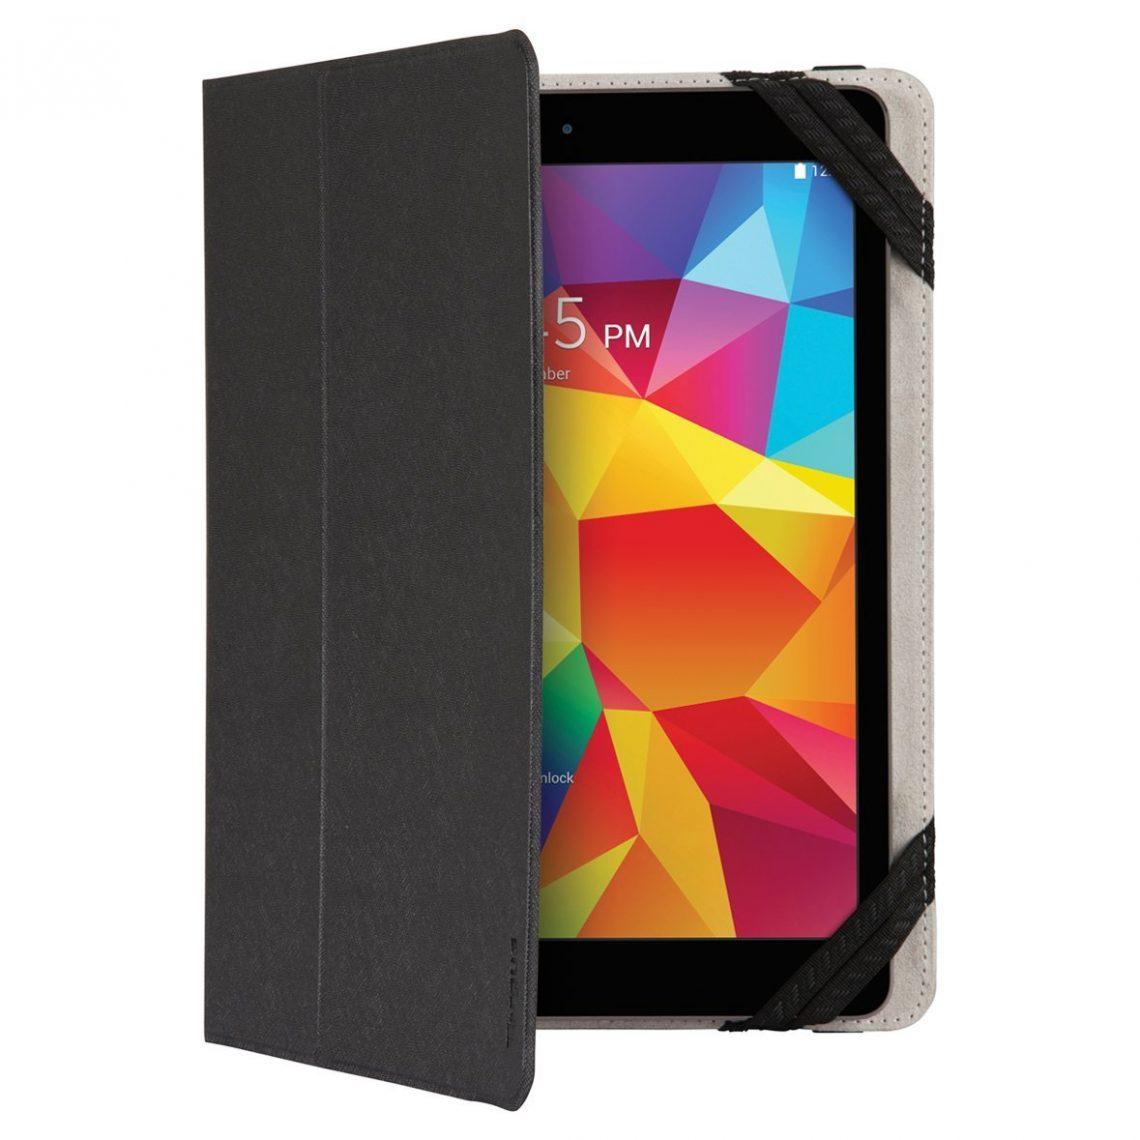 "étui Targus Foliostand 9-10"" Universal Tablet Case"